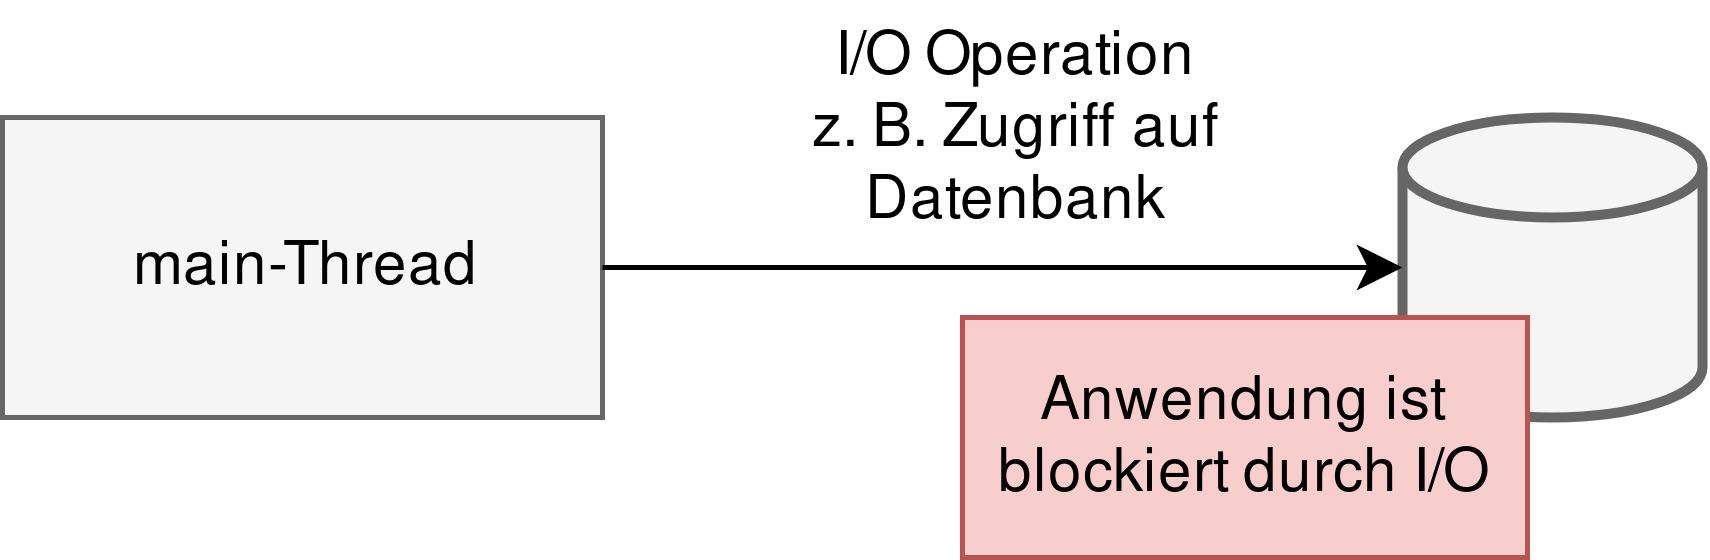 Abbildung 1: main-Thread wird durch I/O blockiert